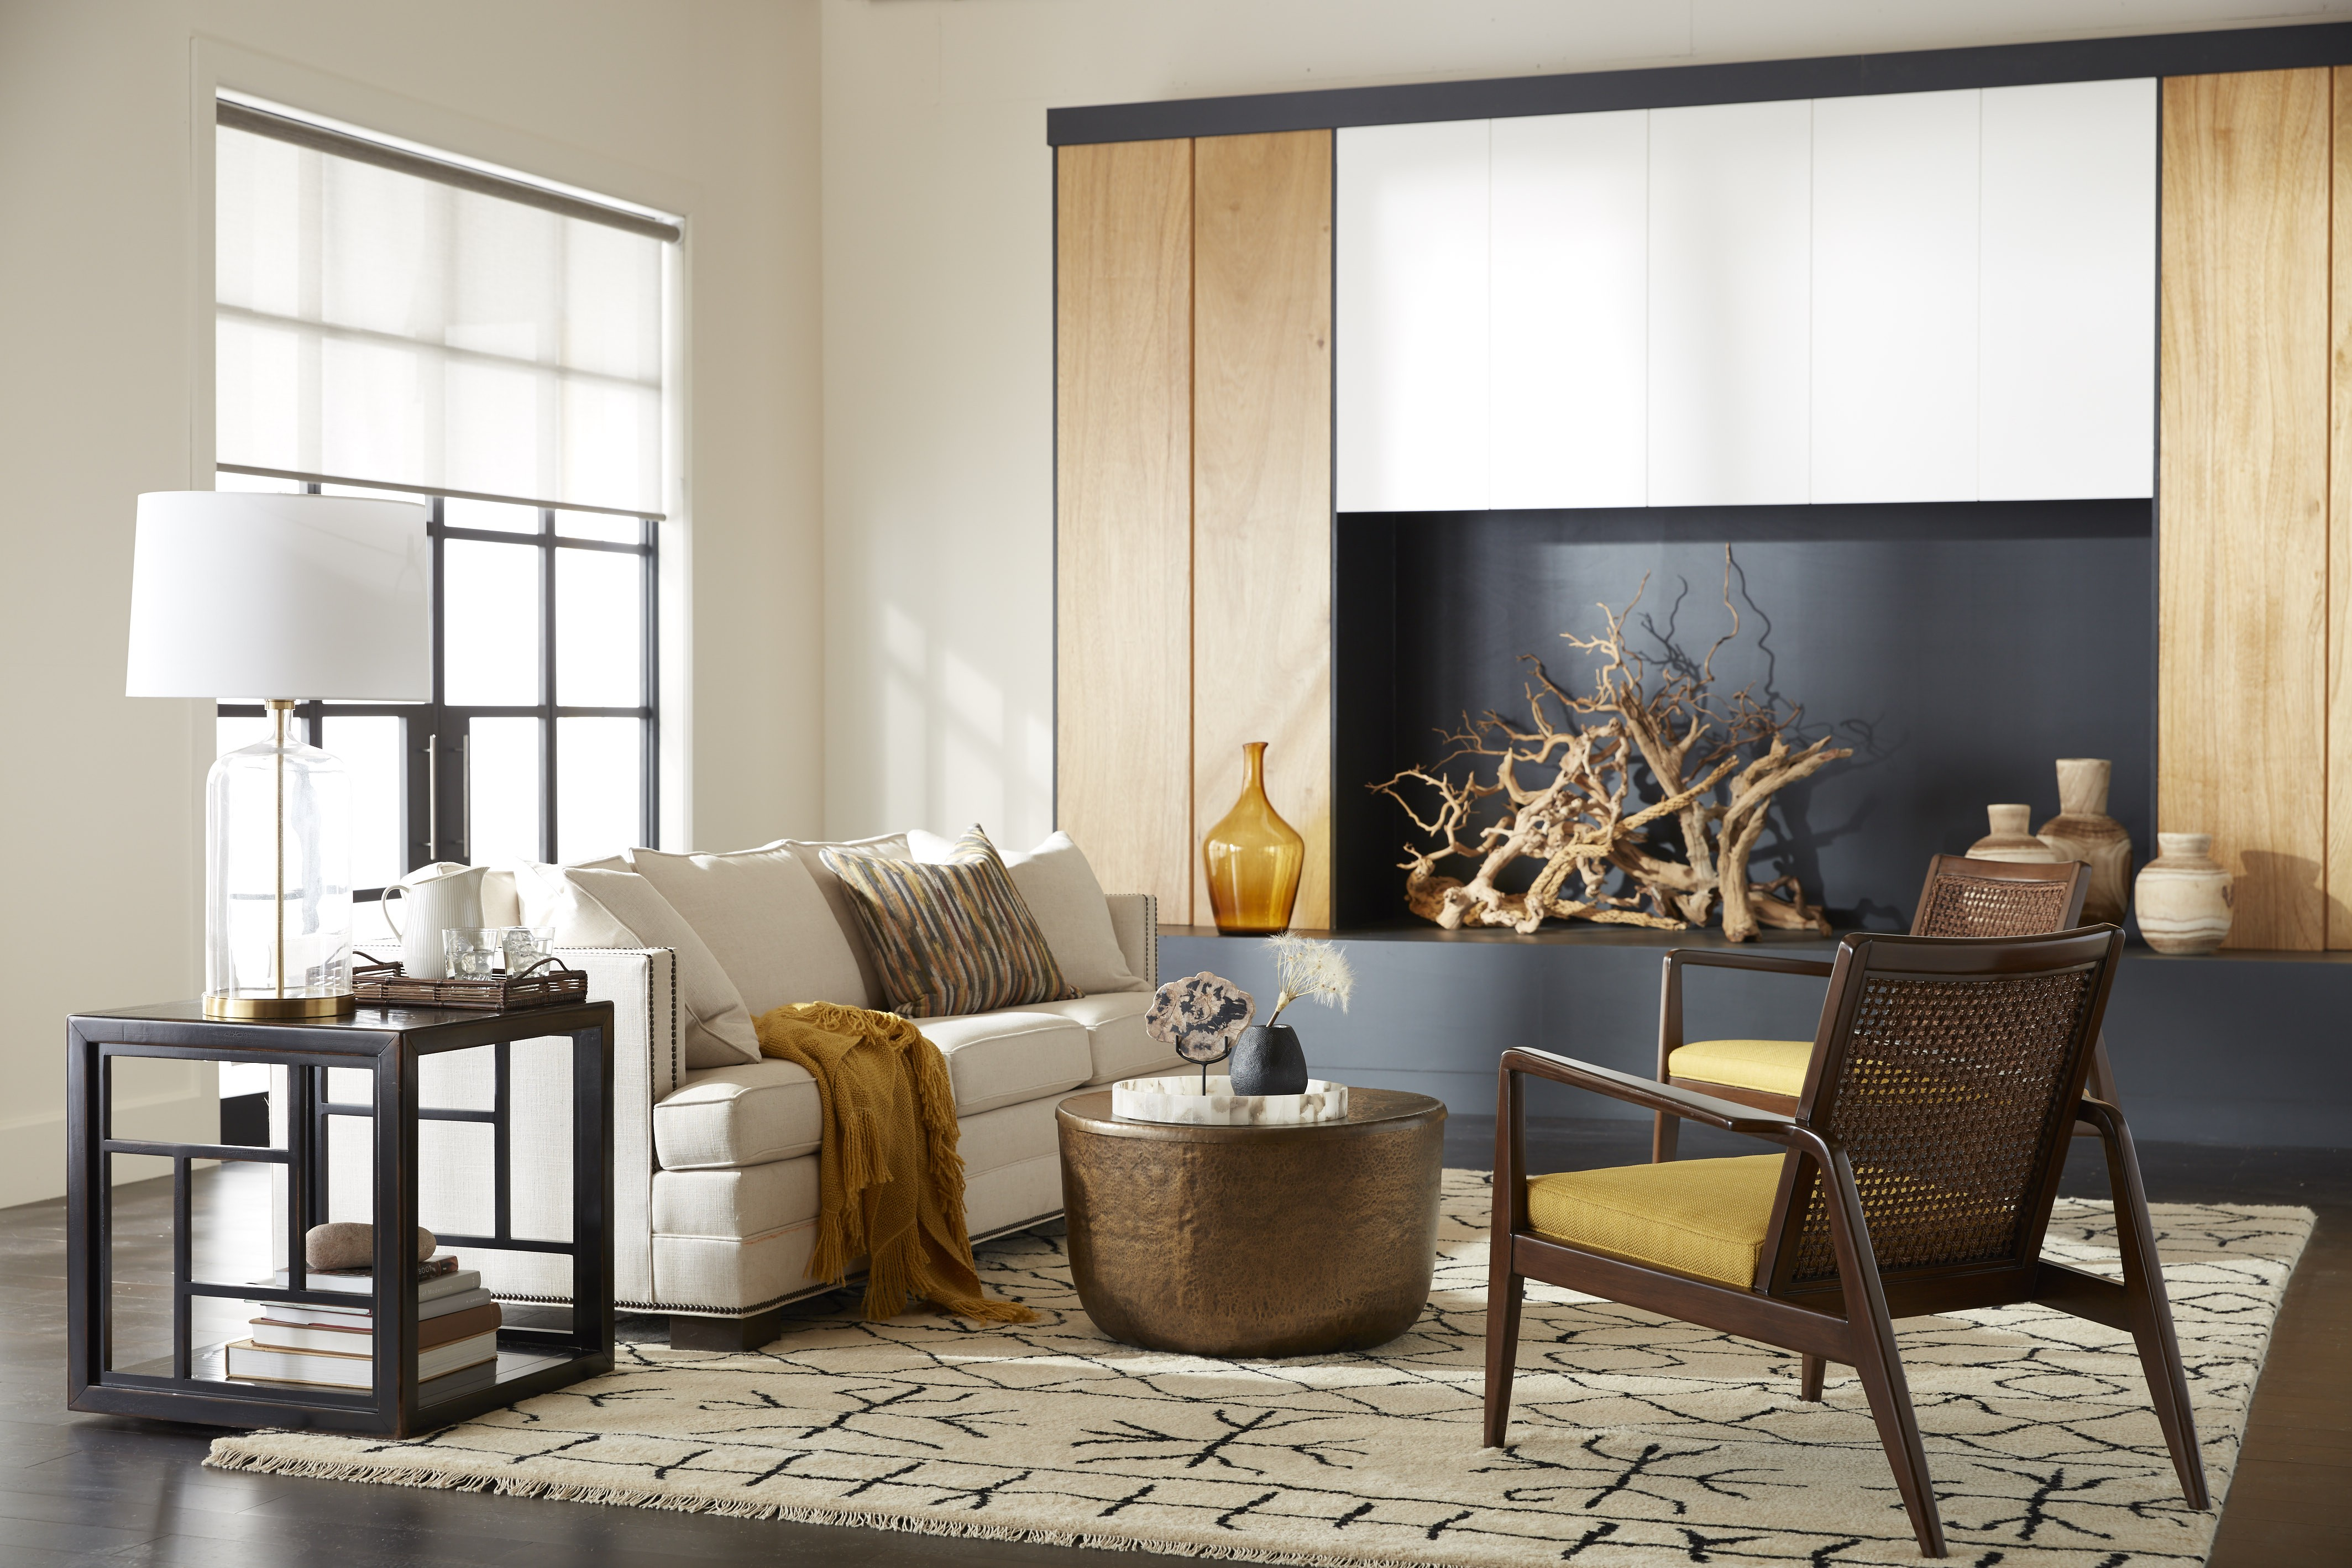 Ethan Allen Global Inc Linkedin, Ethan Allen Furniture